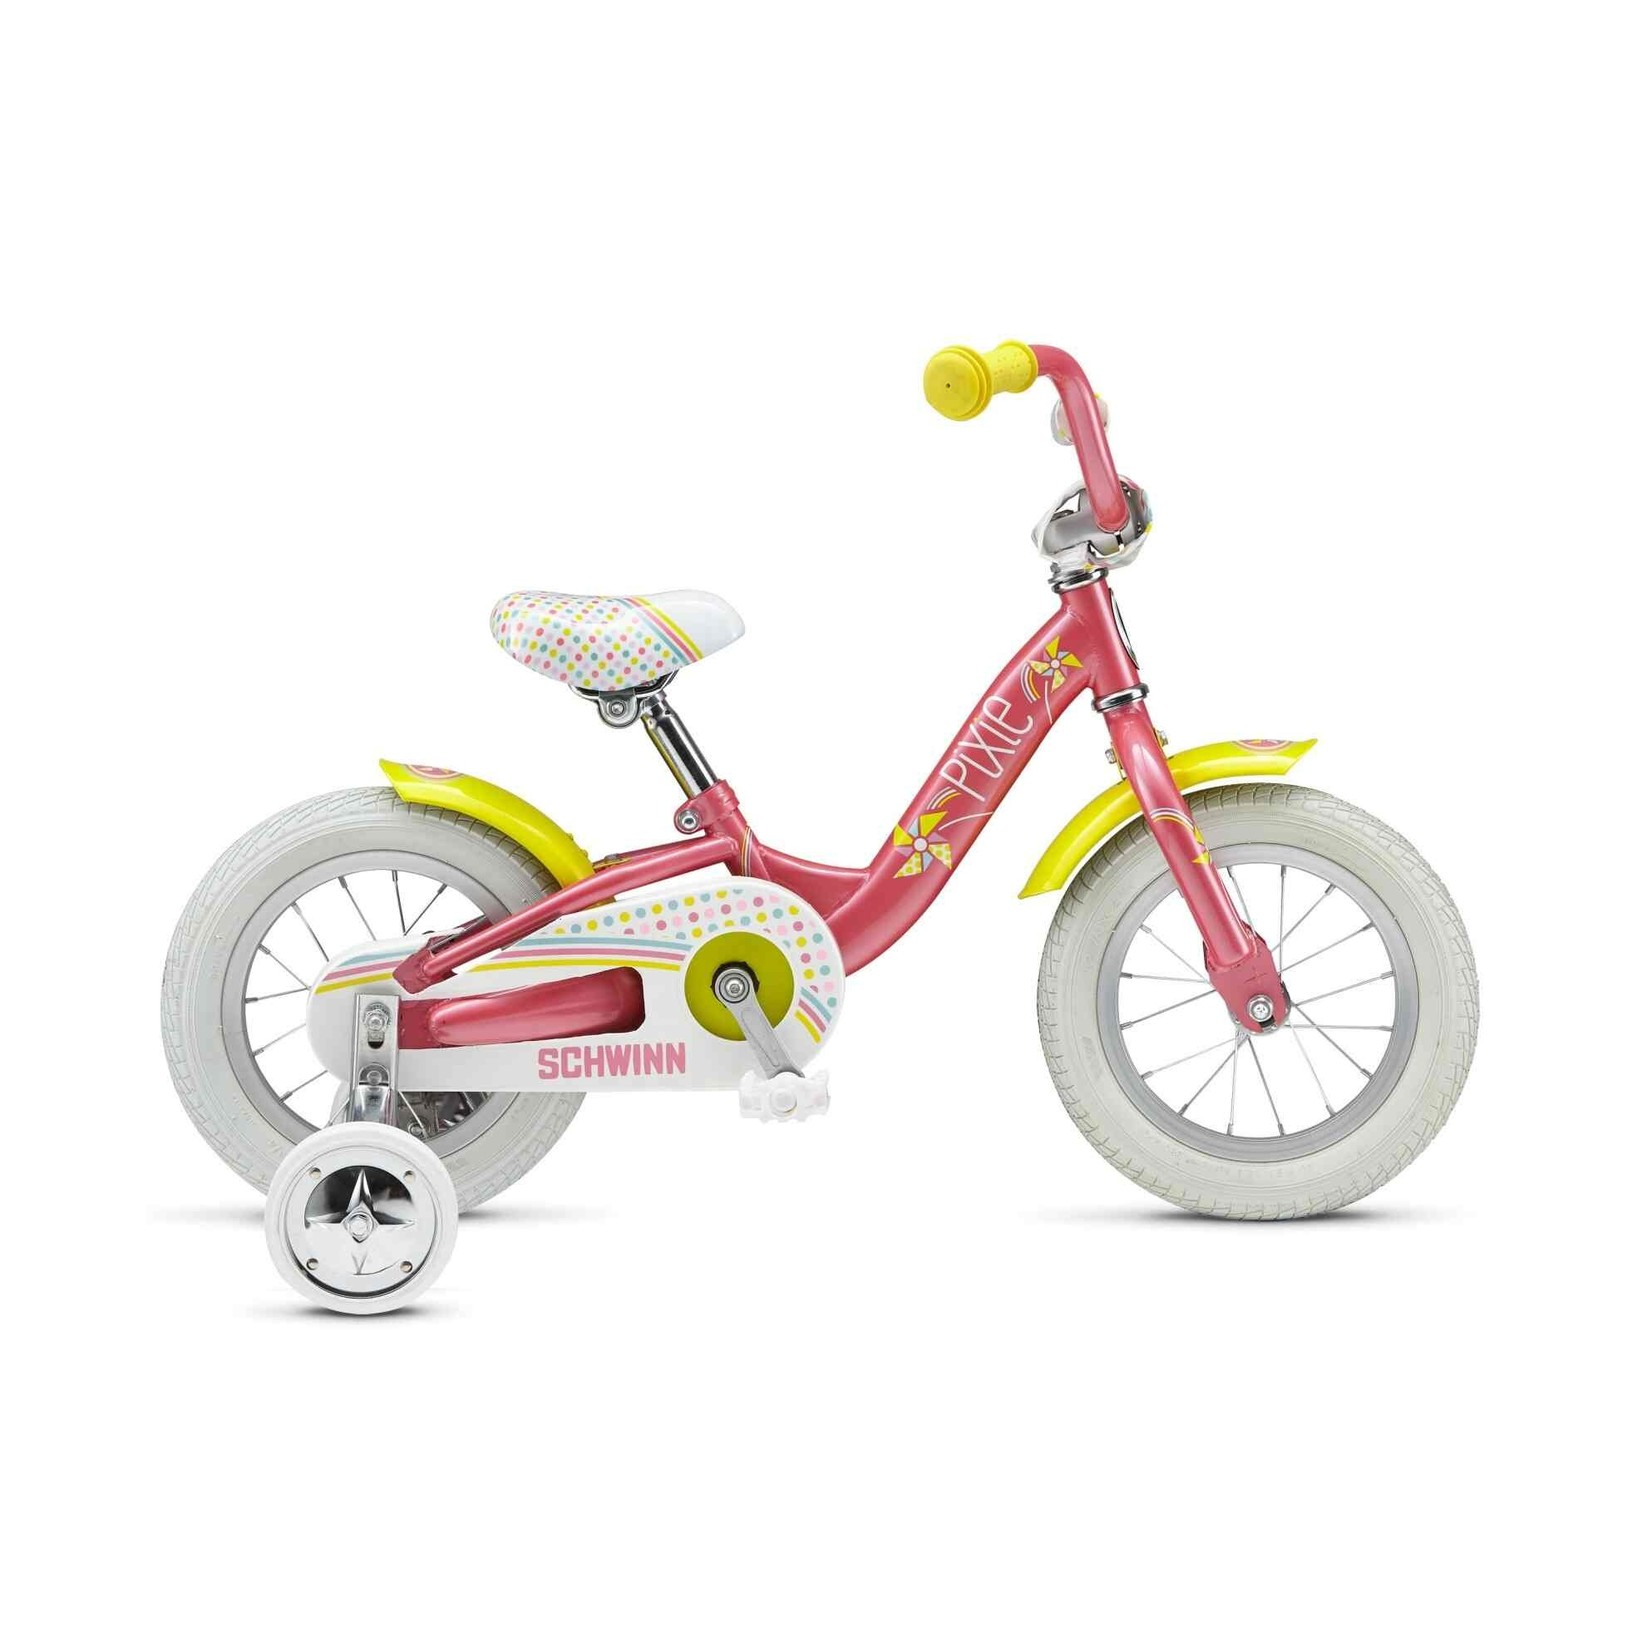 "Schwinn Pixie 12"" Pink / Yellow"